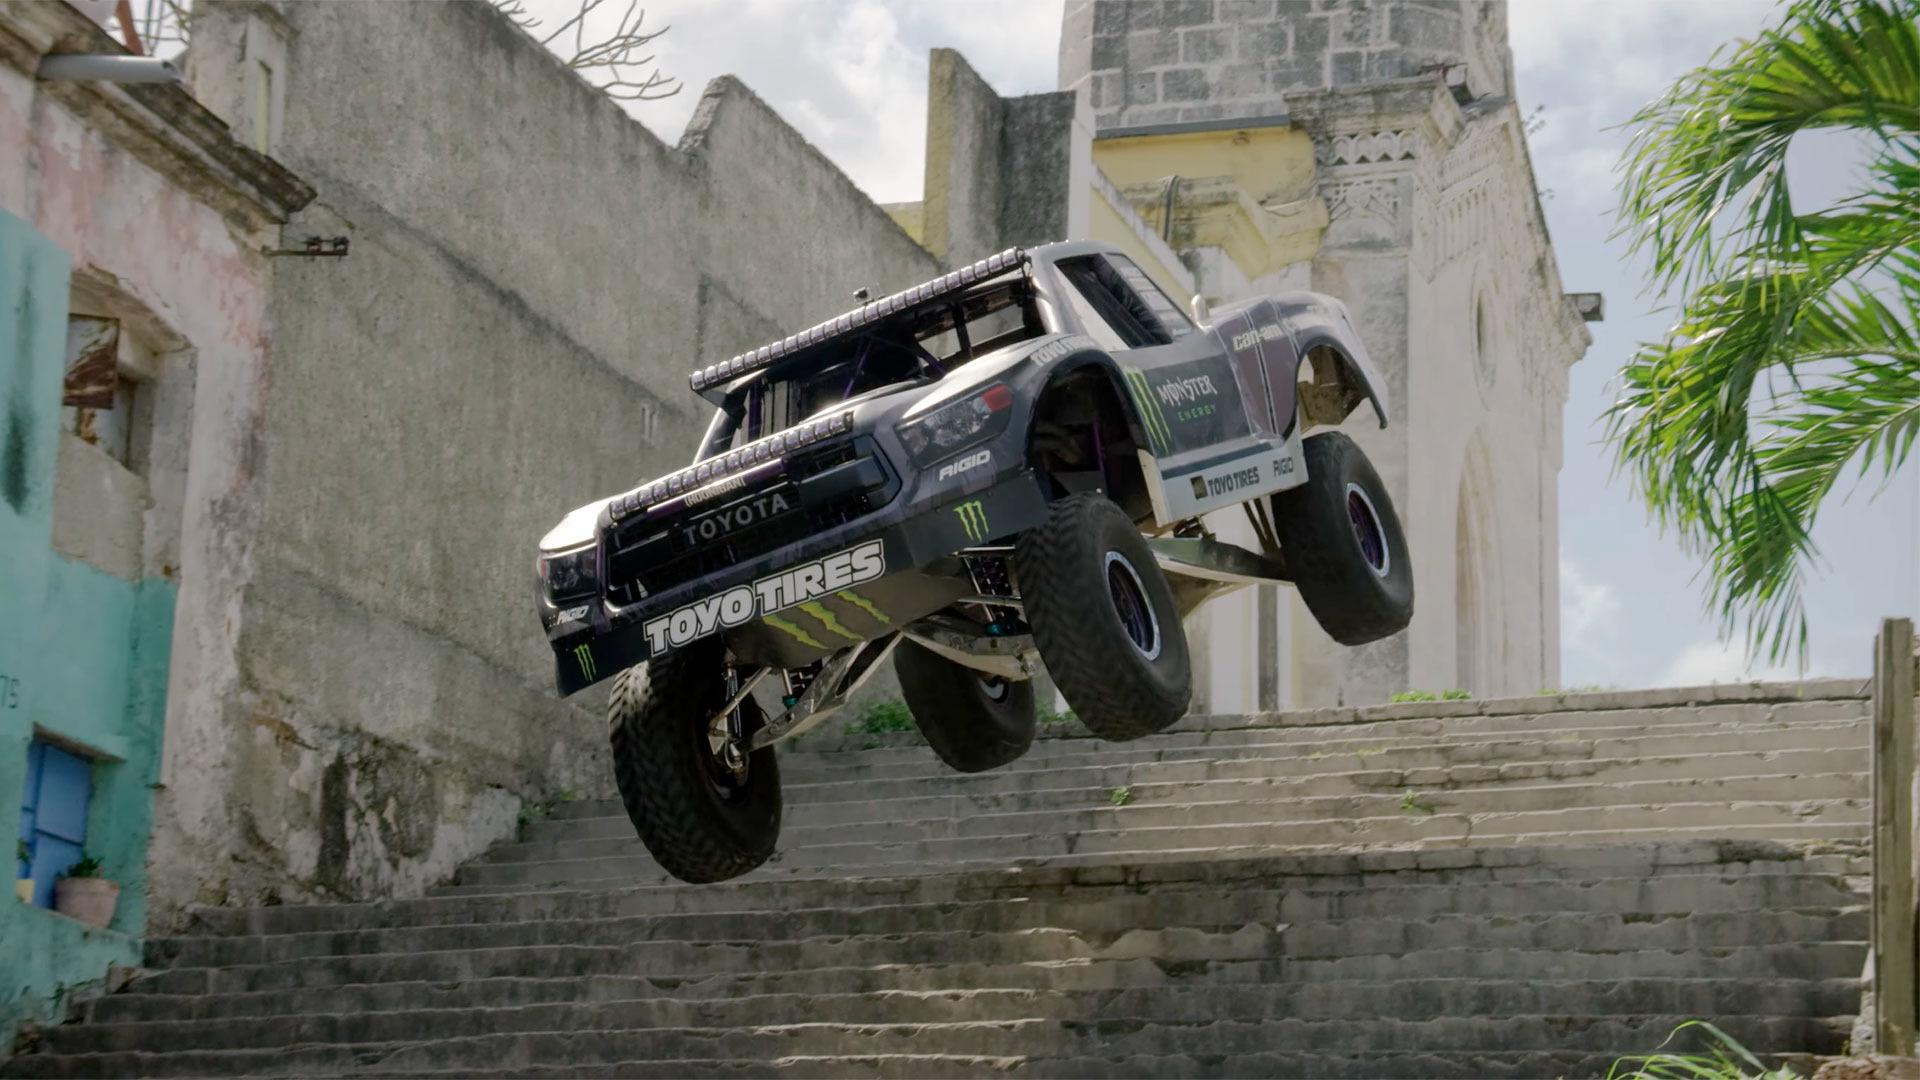 Forza 7 Car Wallpaper Watch Bj Baldwin S Trophy Truck Storm Through Havana